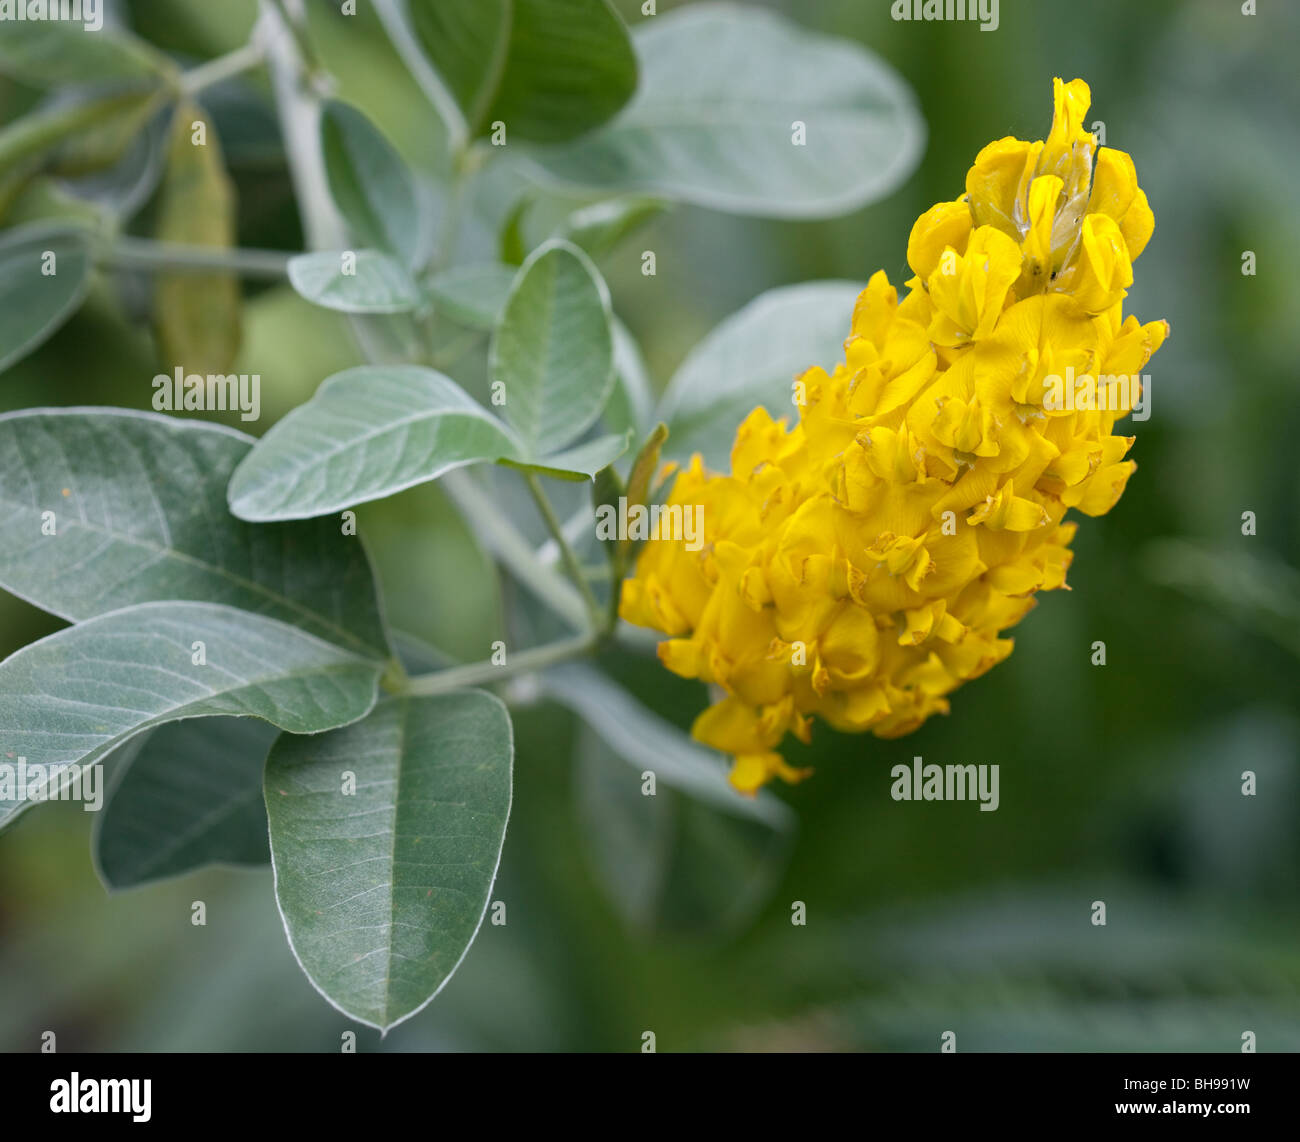 Cystius Battandieri Yellow Tail Stockbild